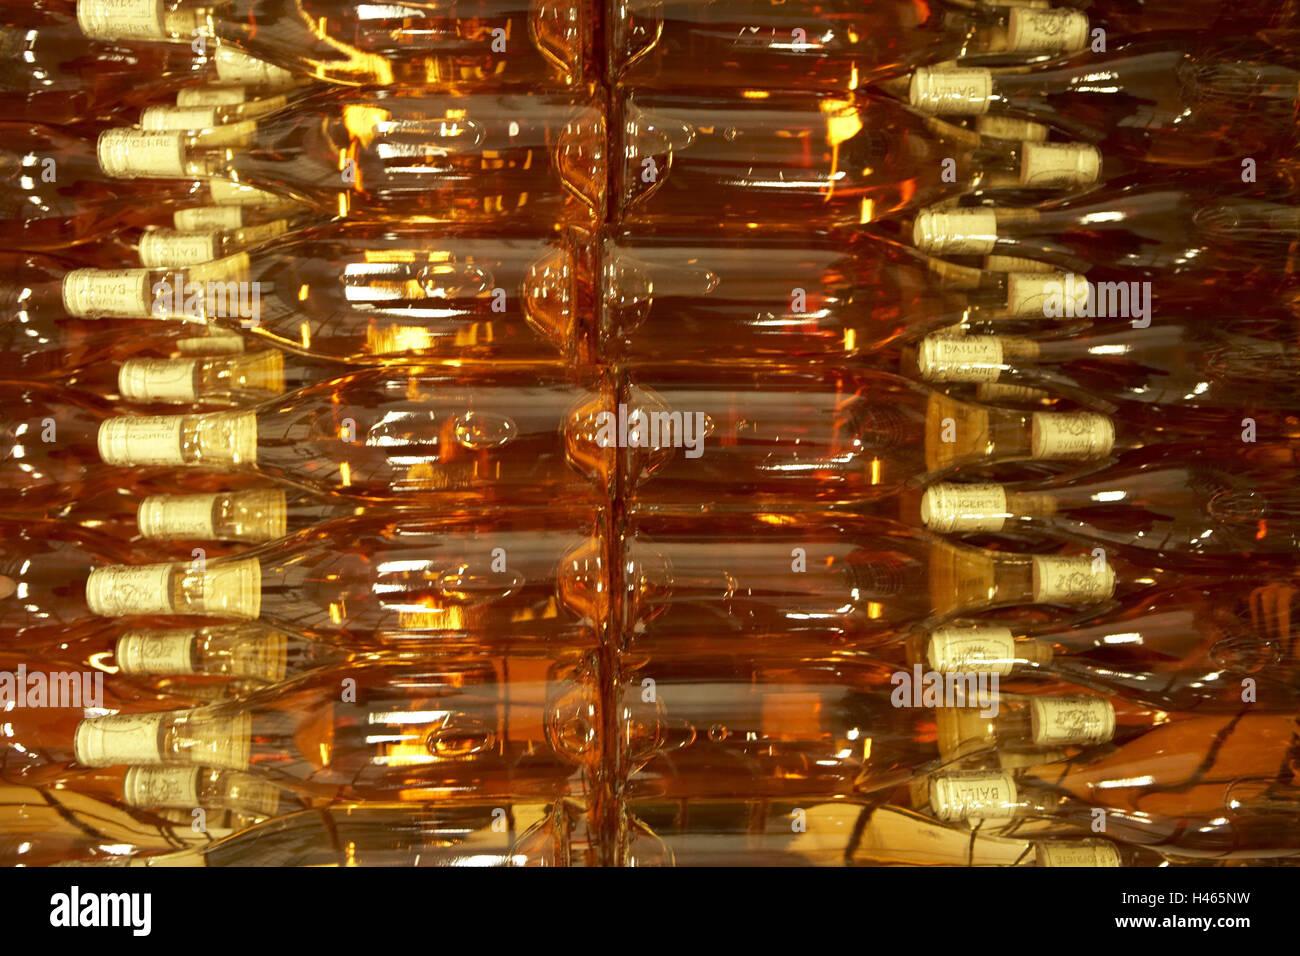 Support Bottles rose wine detail Winzerei Weinkelterei Kelterei storage  sc 1 st  Alamy & Wine Warehouse Stock Photos u0026 Wine Warehouse Stock Images - Alamy